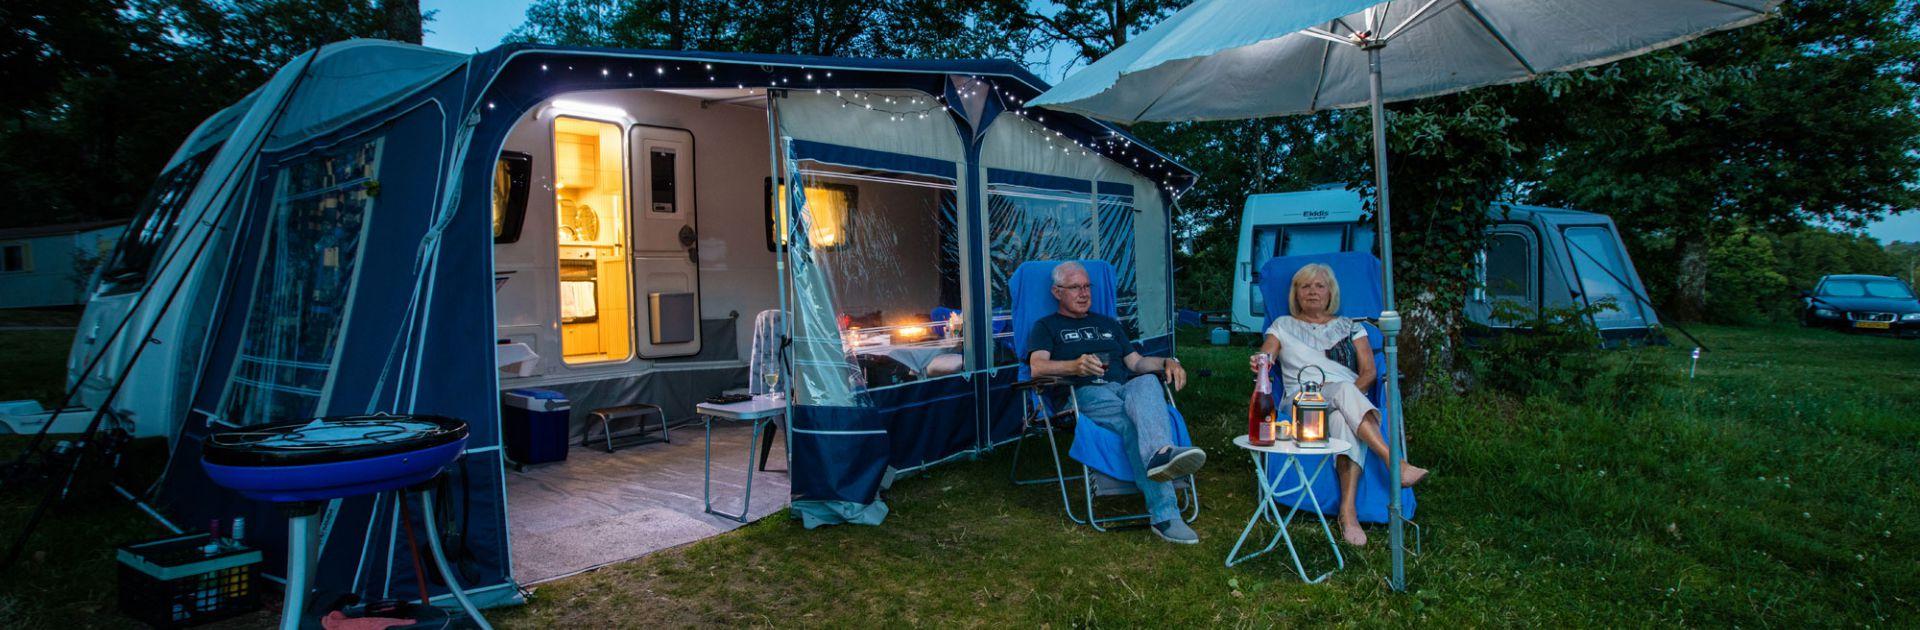 Campingplaats sanitair individueel Dordogne